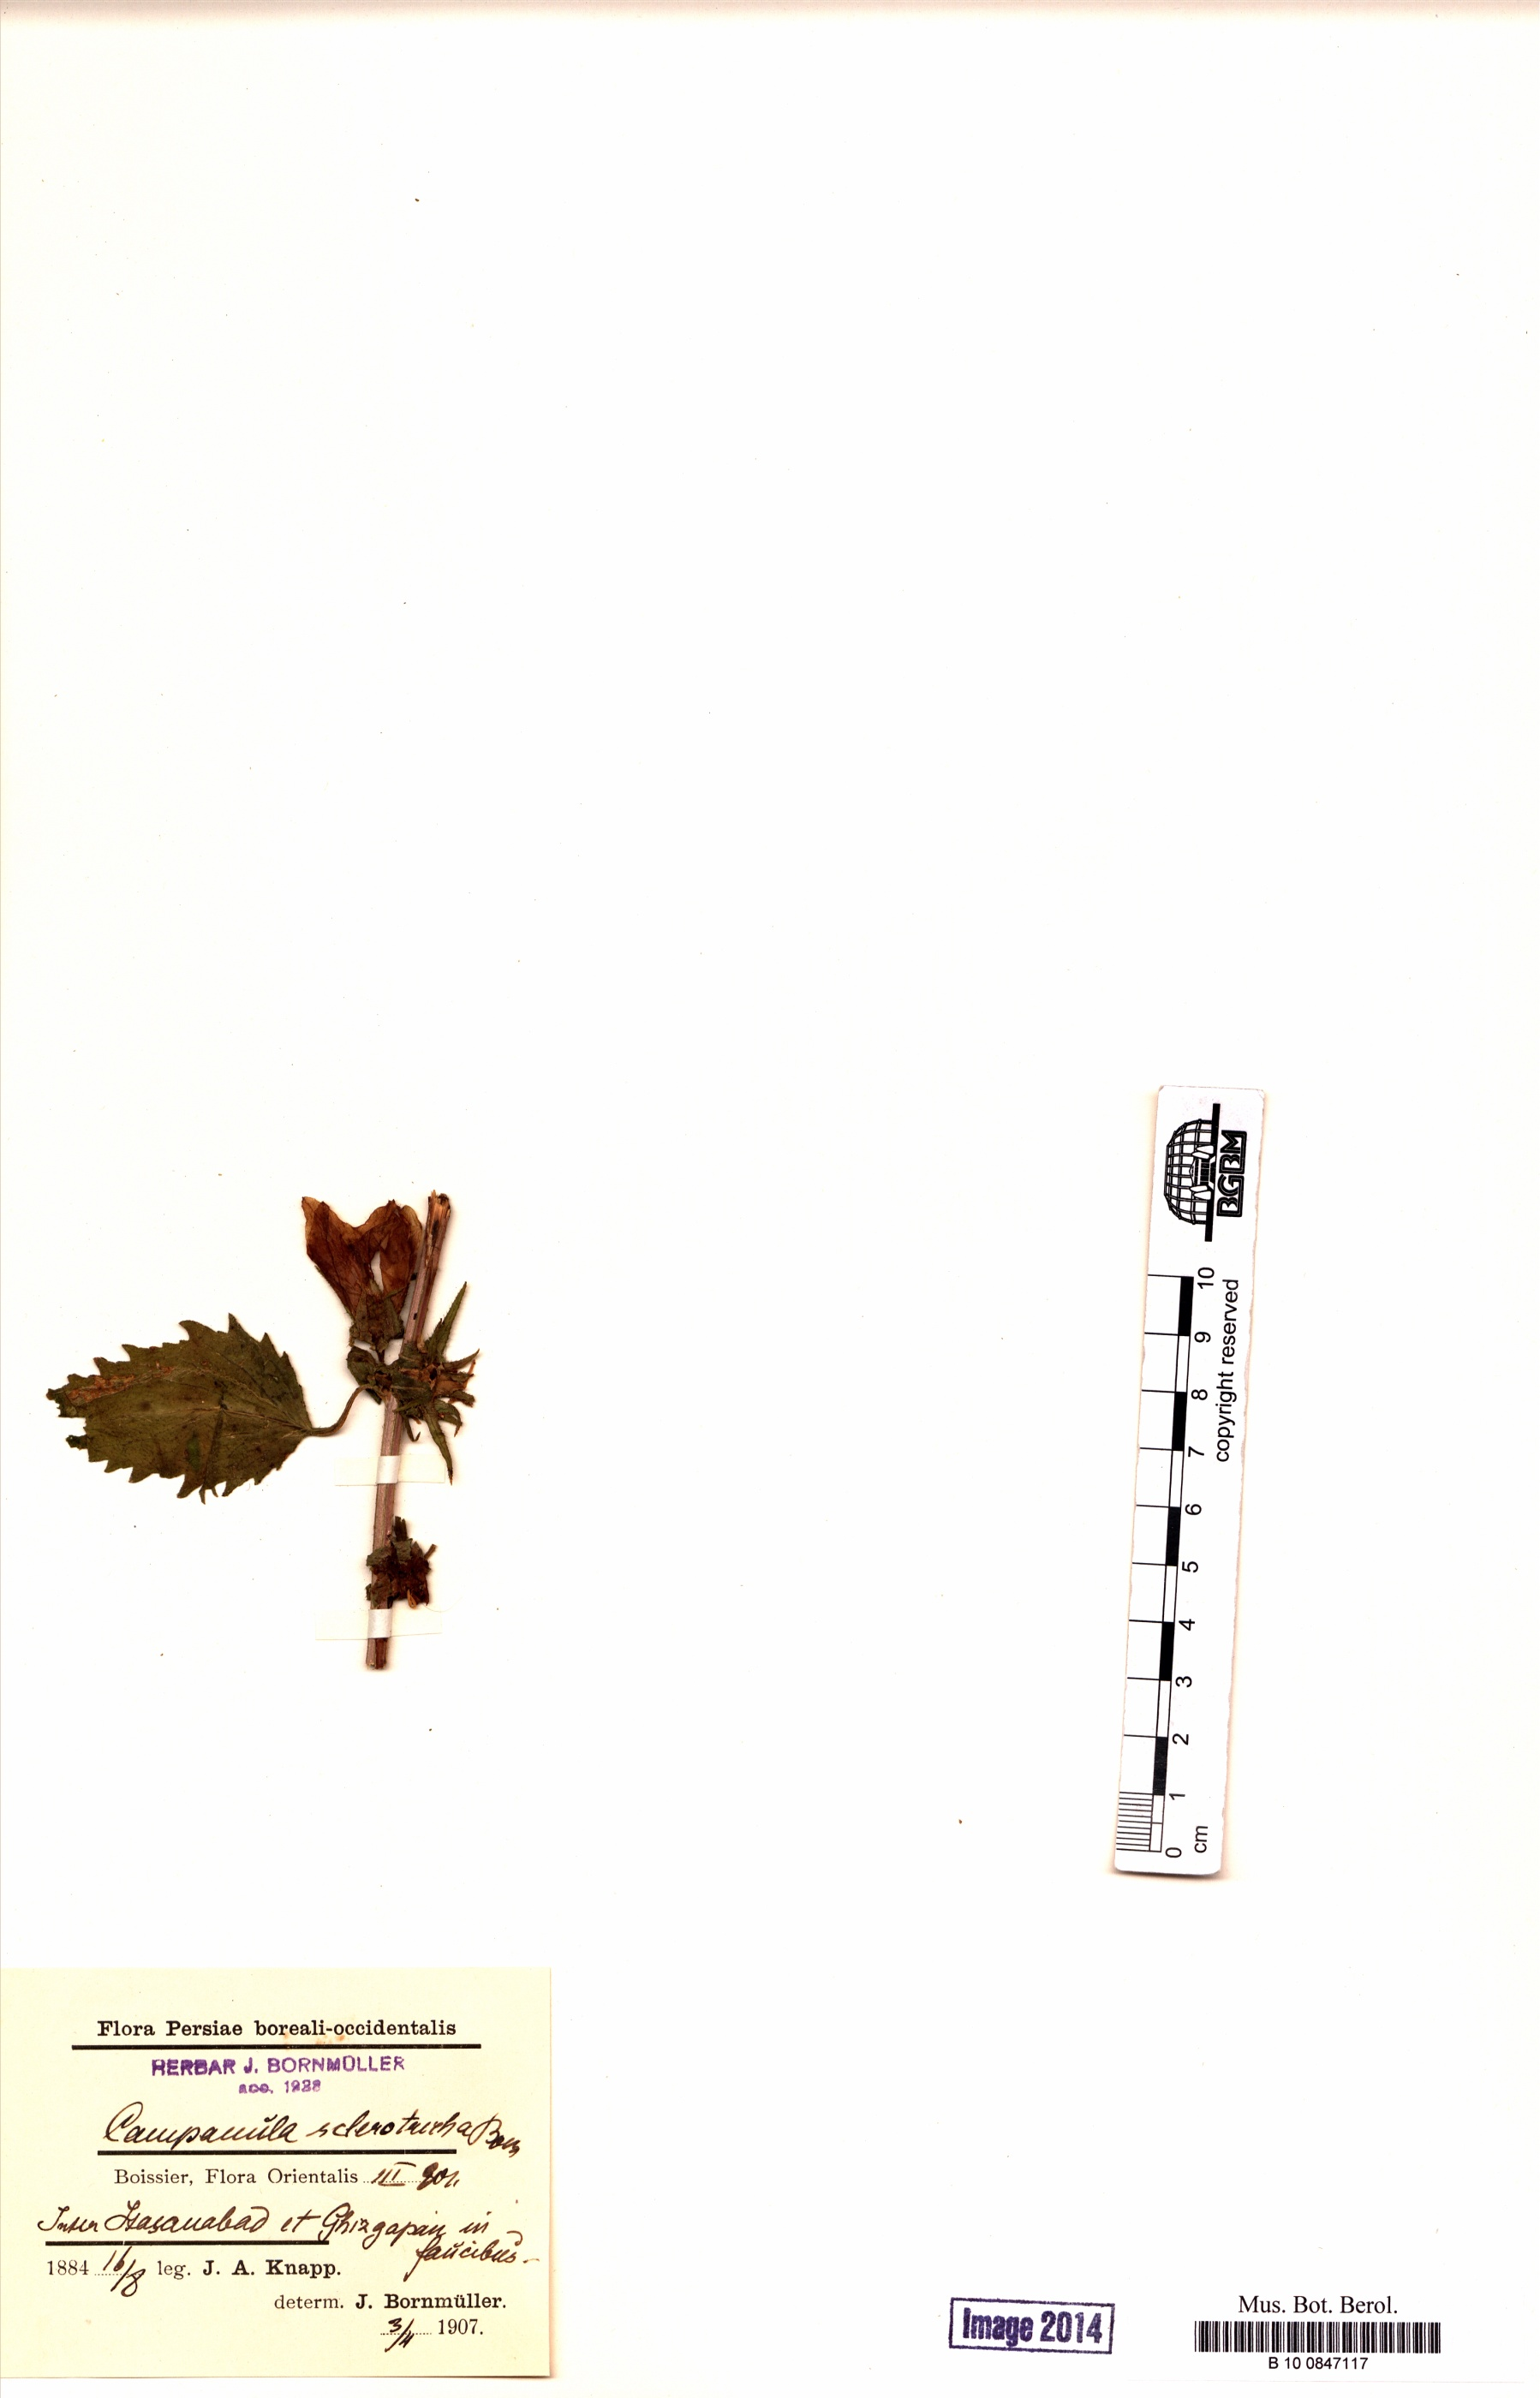 http://ww2.bgbm.org/herbarium/images/B/10/08/47/11/B_10_0847117.jpg